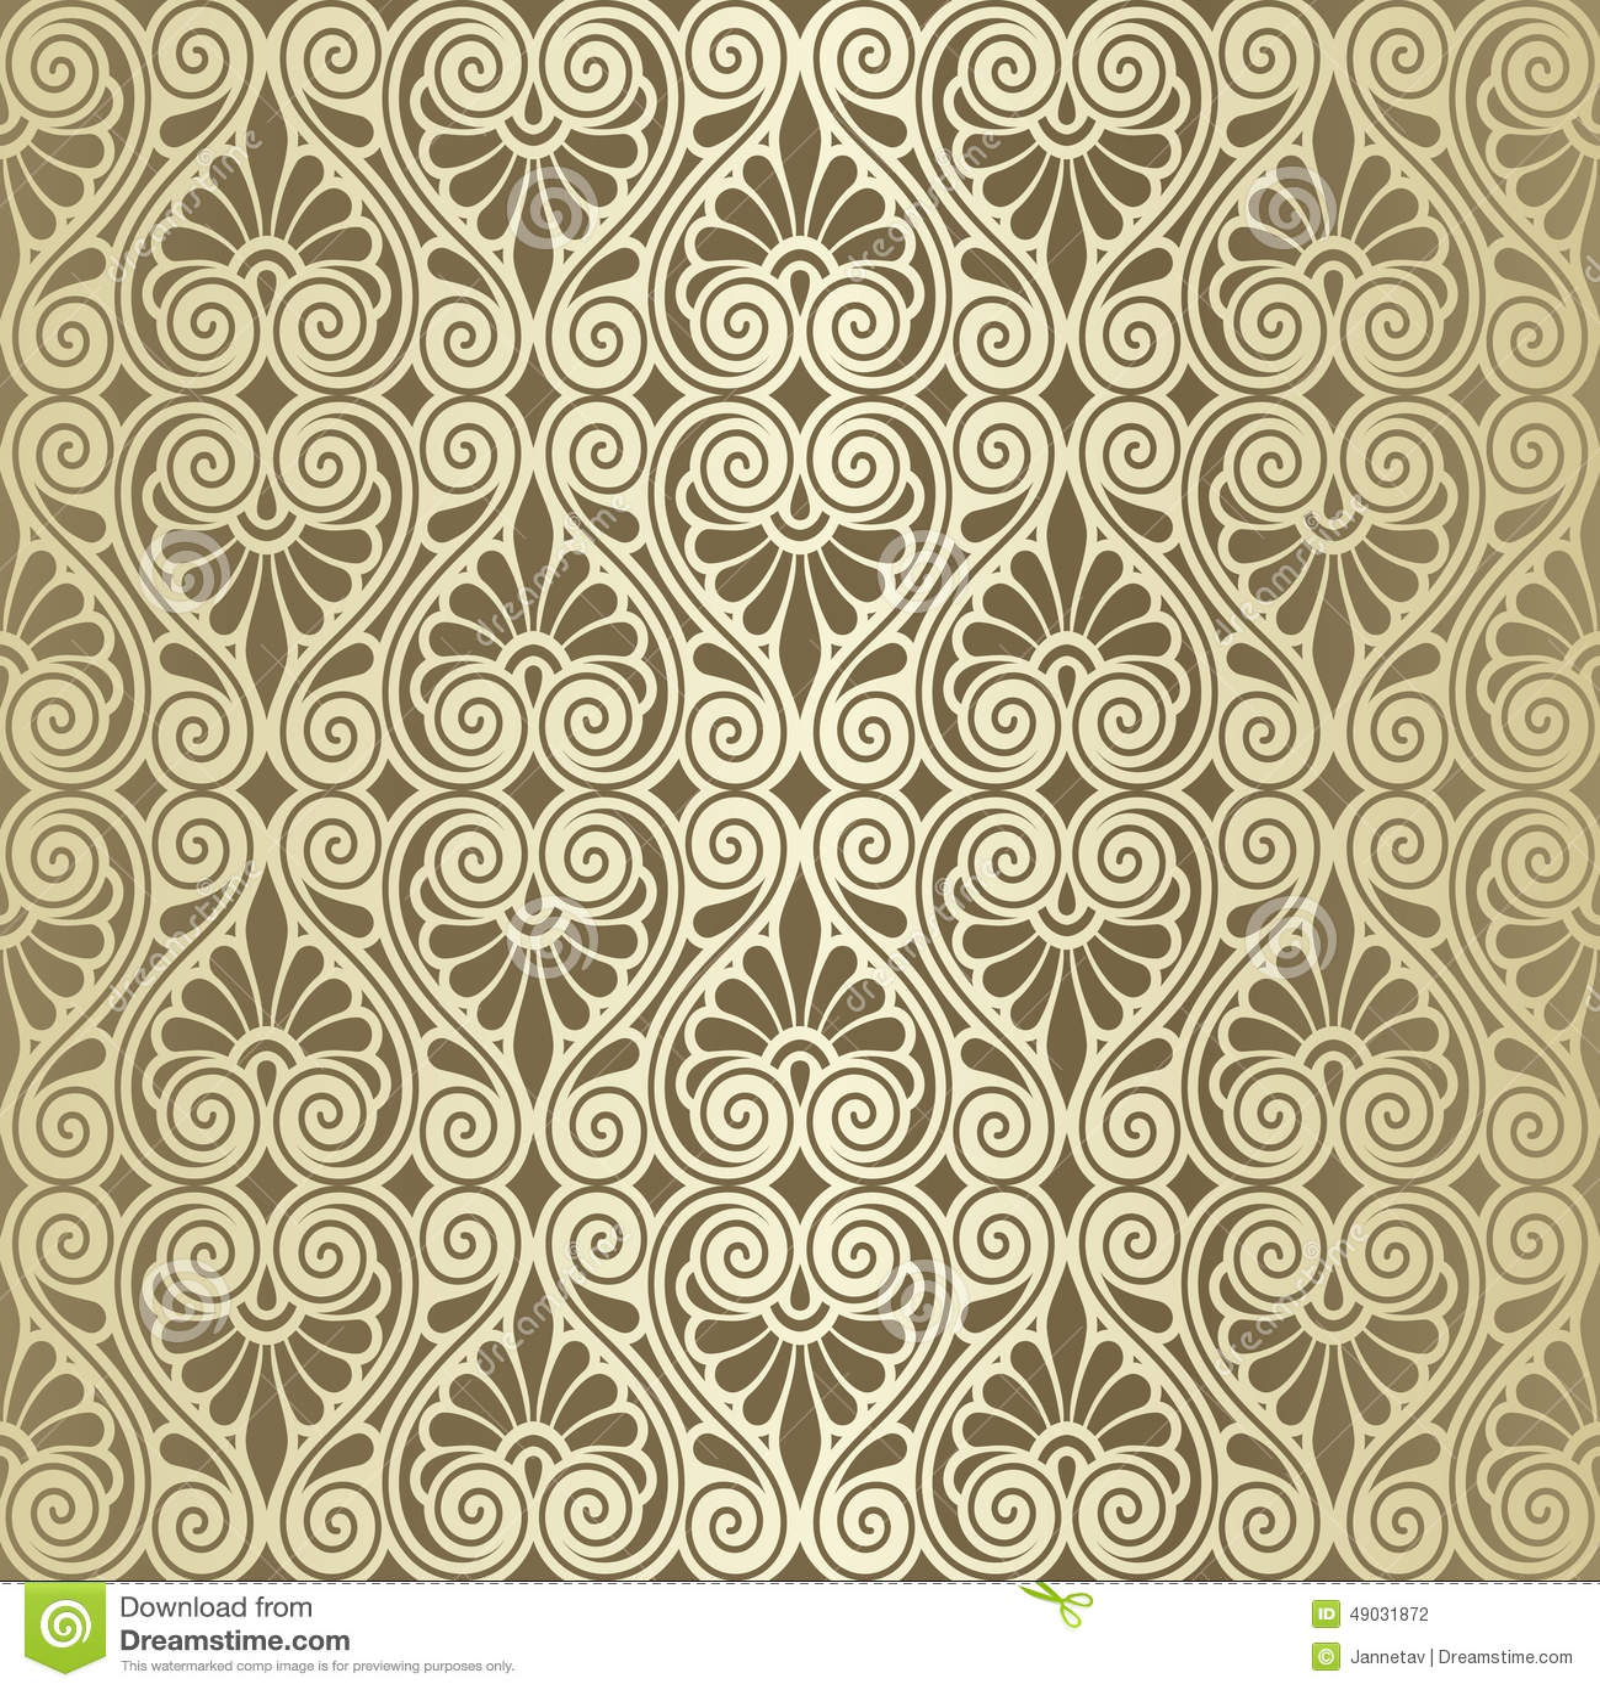 vector seamless renaissance wallpaper - photo #4